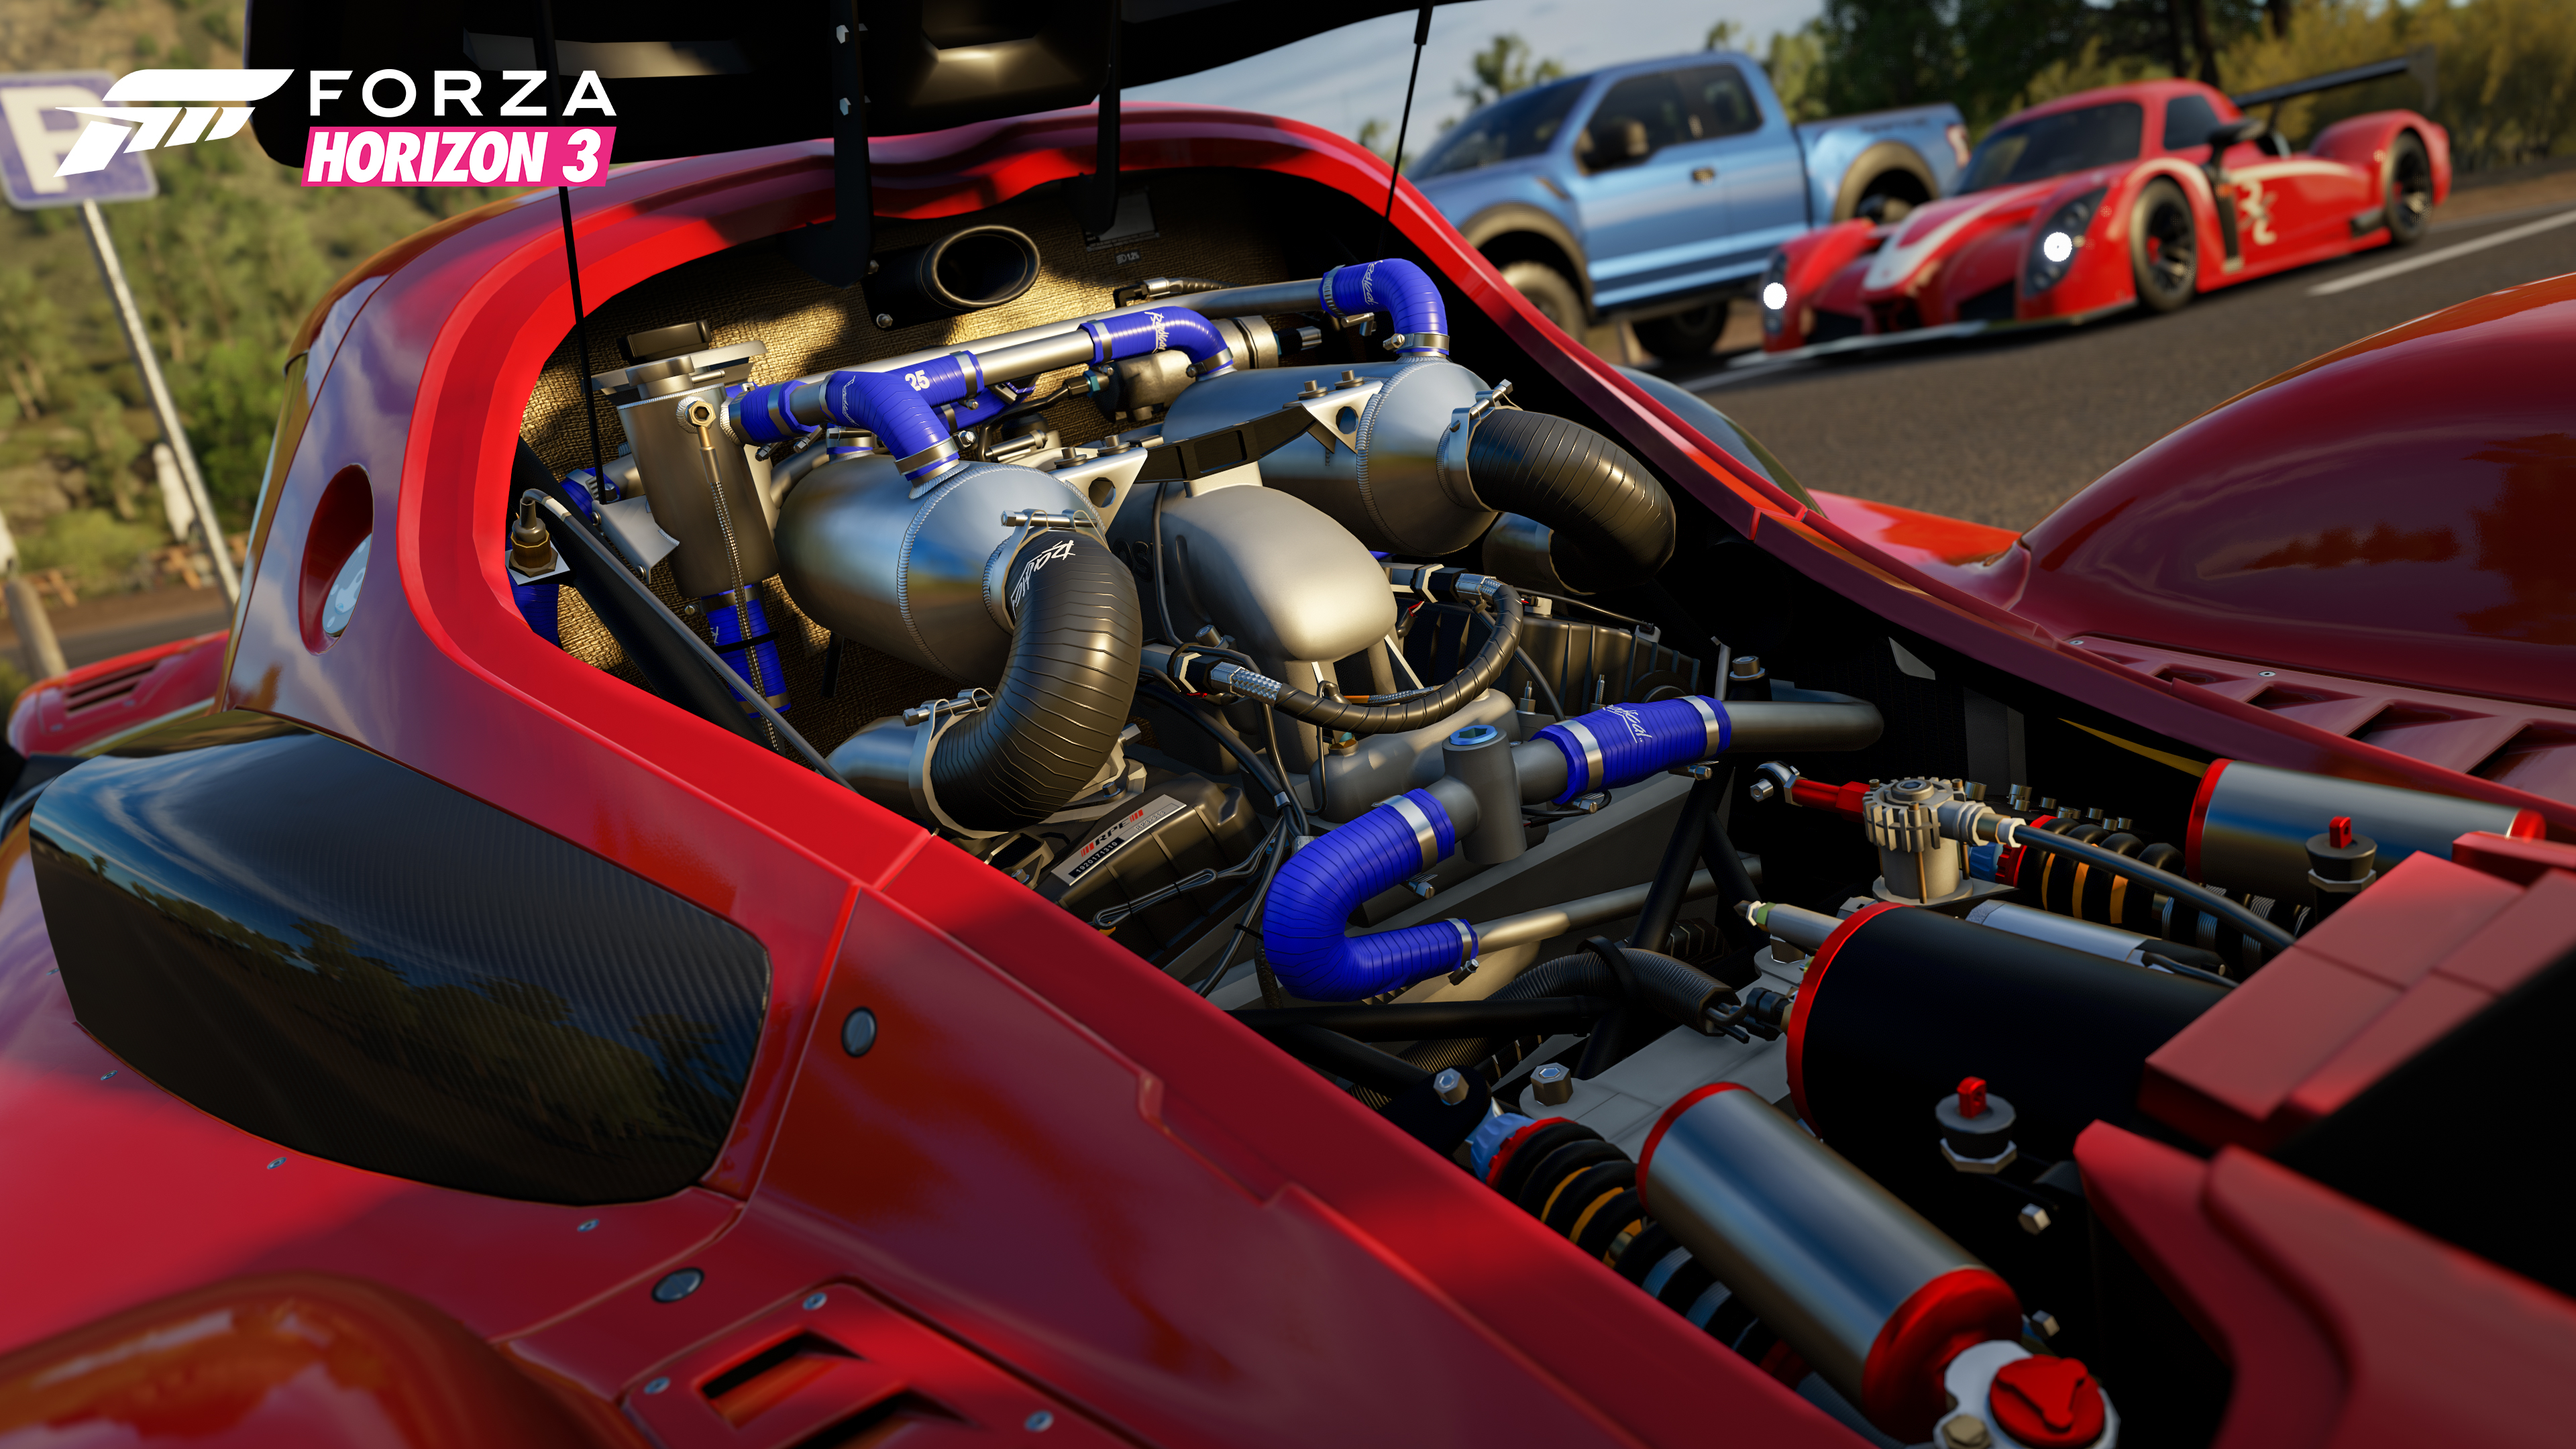 Forza Horizon 3 Rockstar Car Pack Celebrates the New Year With